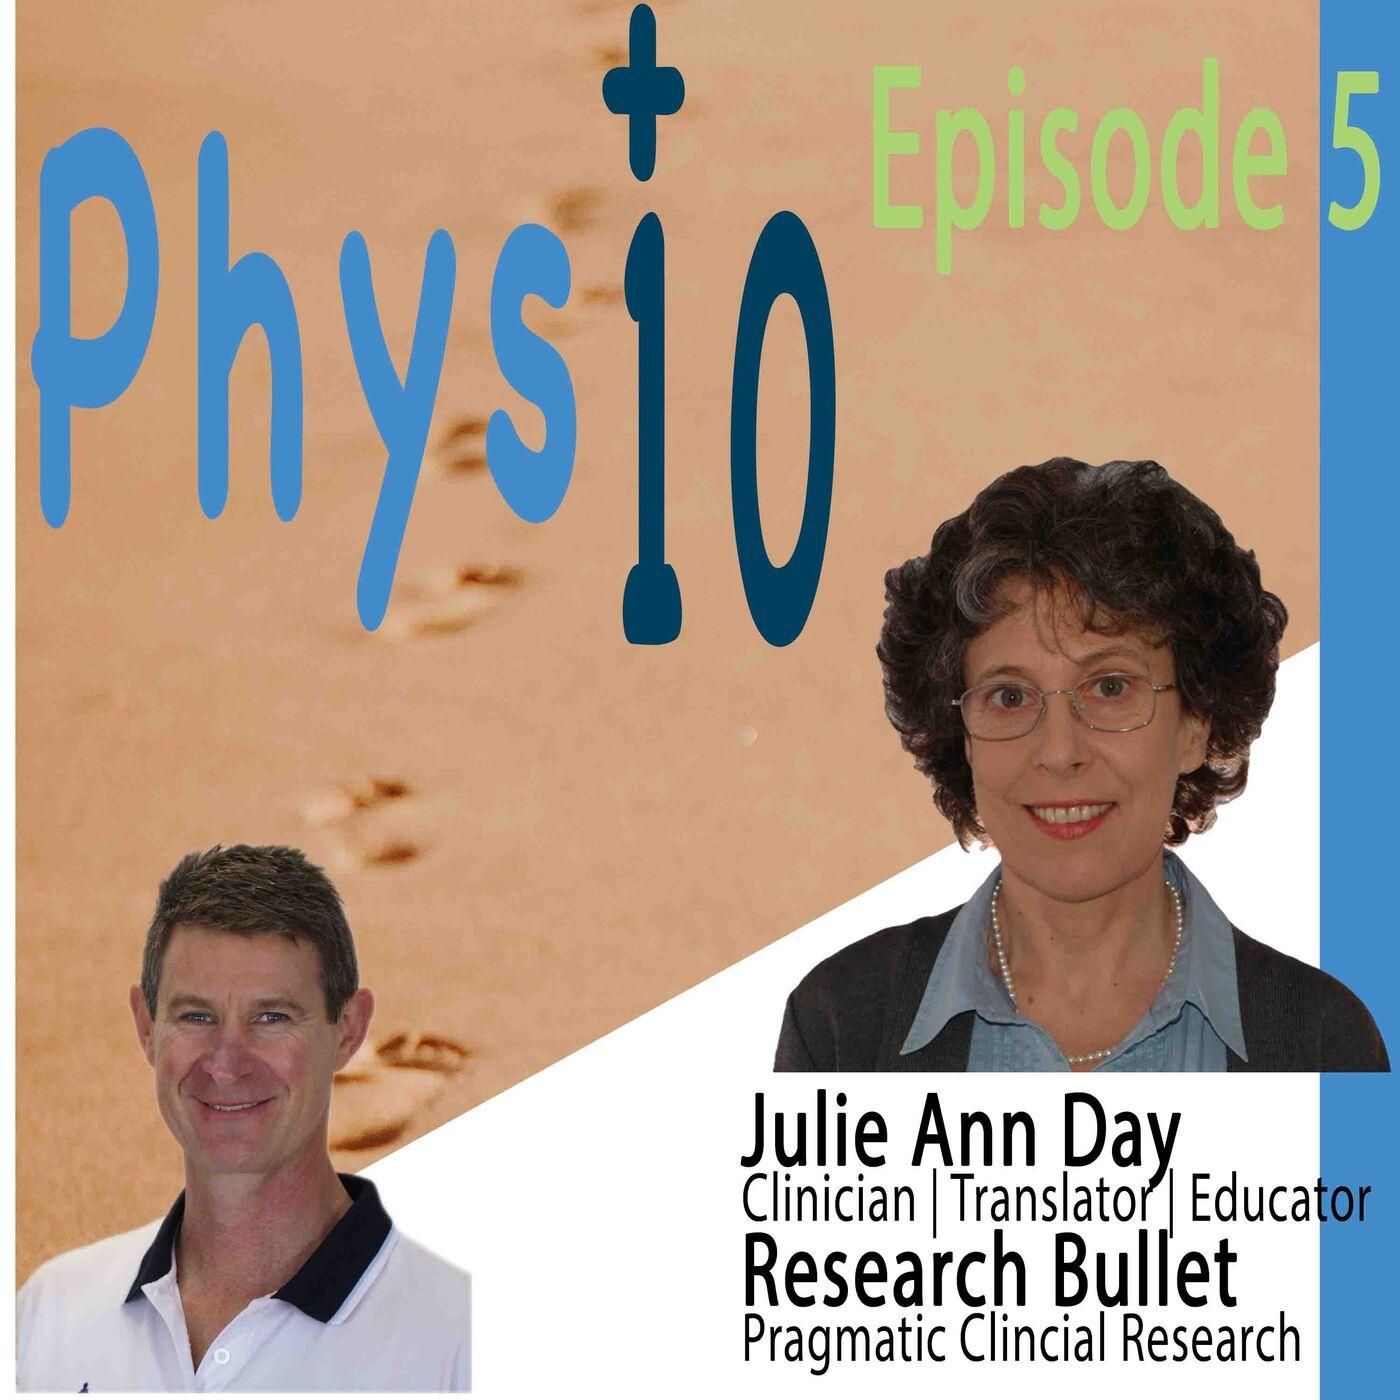 Julie Ann Day: Clinician | Educator | Translator  | Research Bullet: Pragmatic Clinical Research